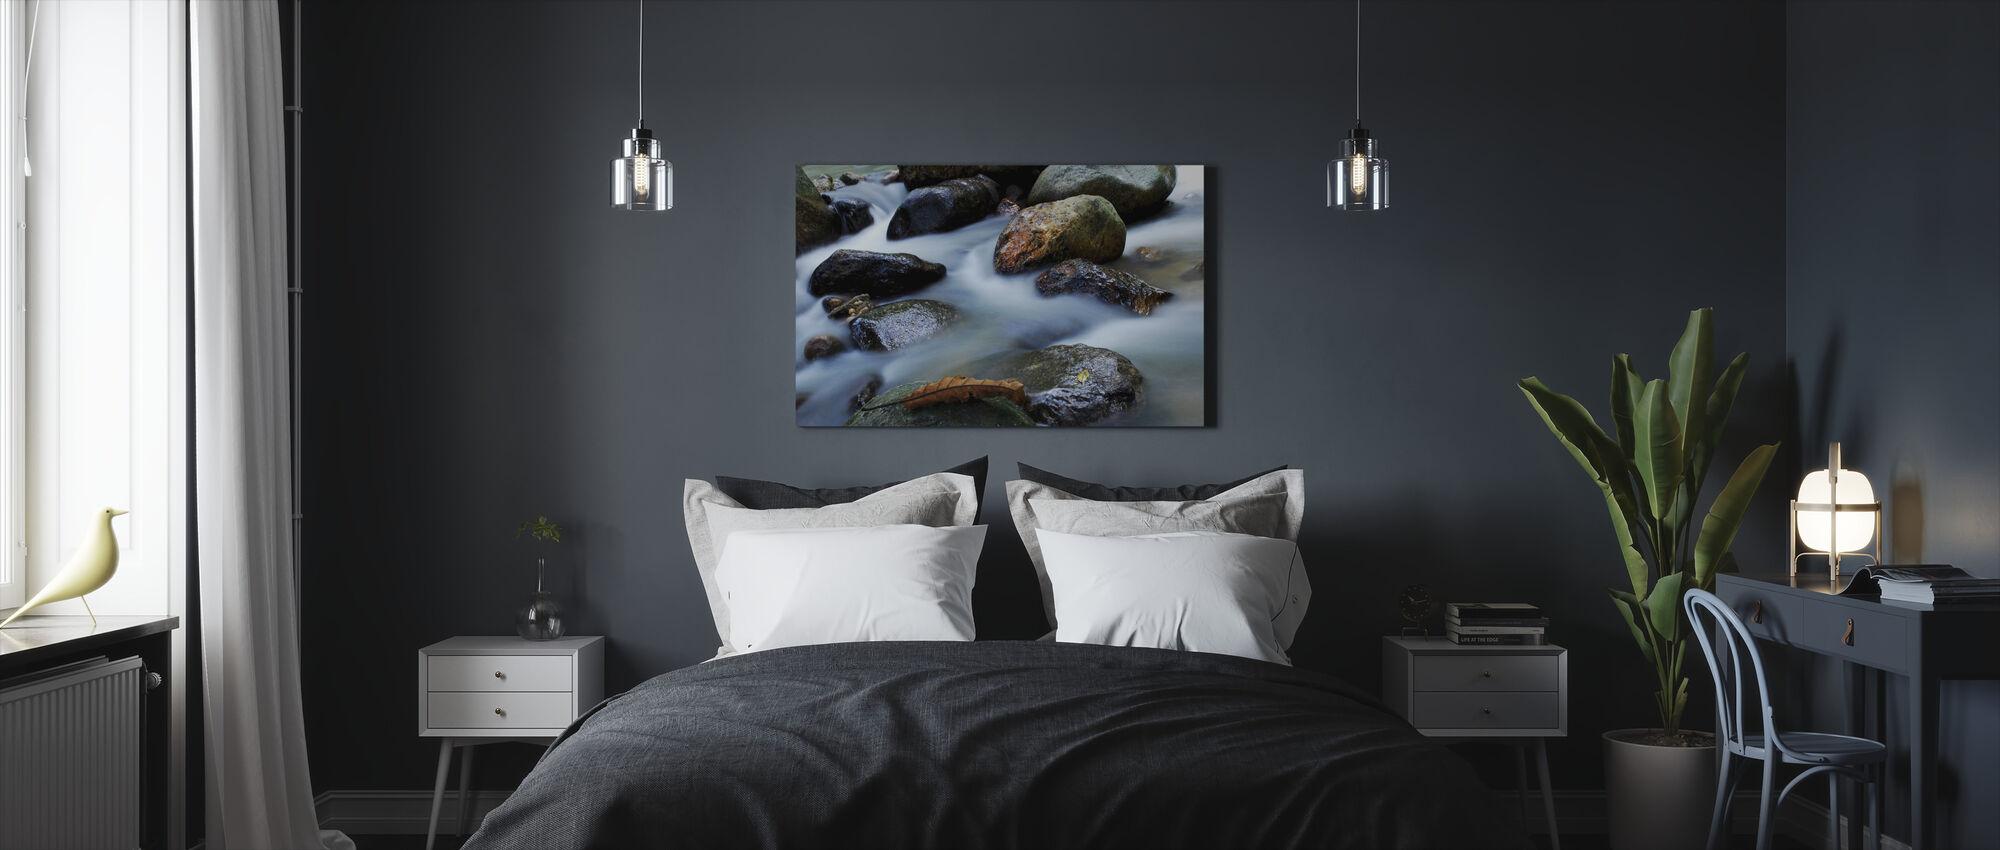 Vattenfall närbild - Canvastavla - Sovrum